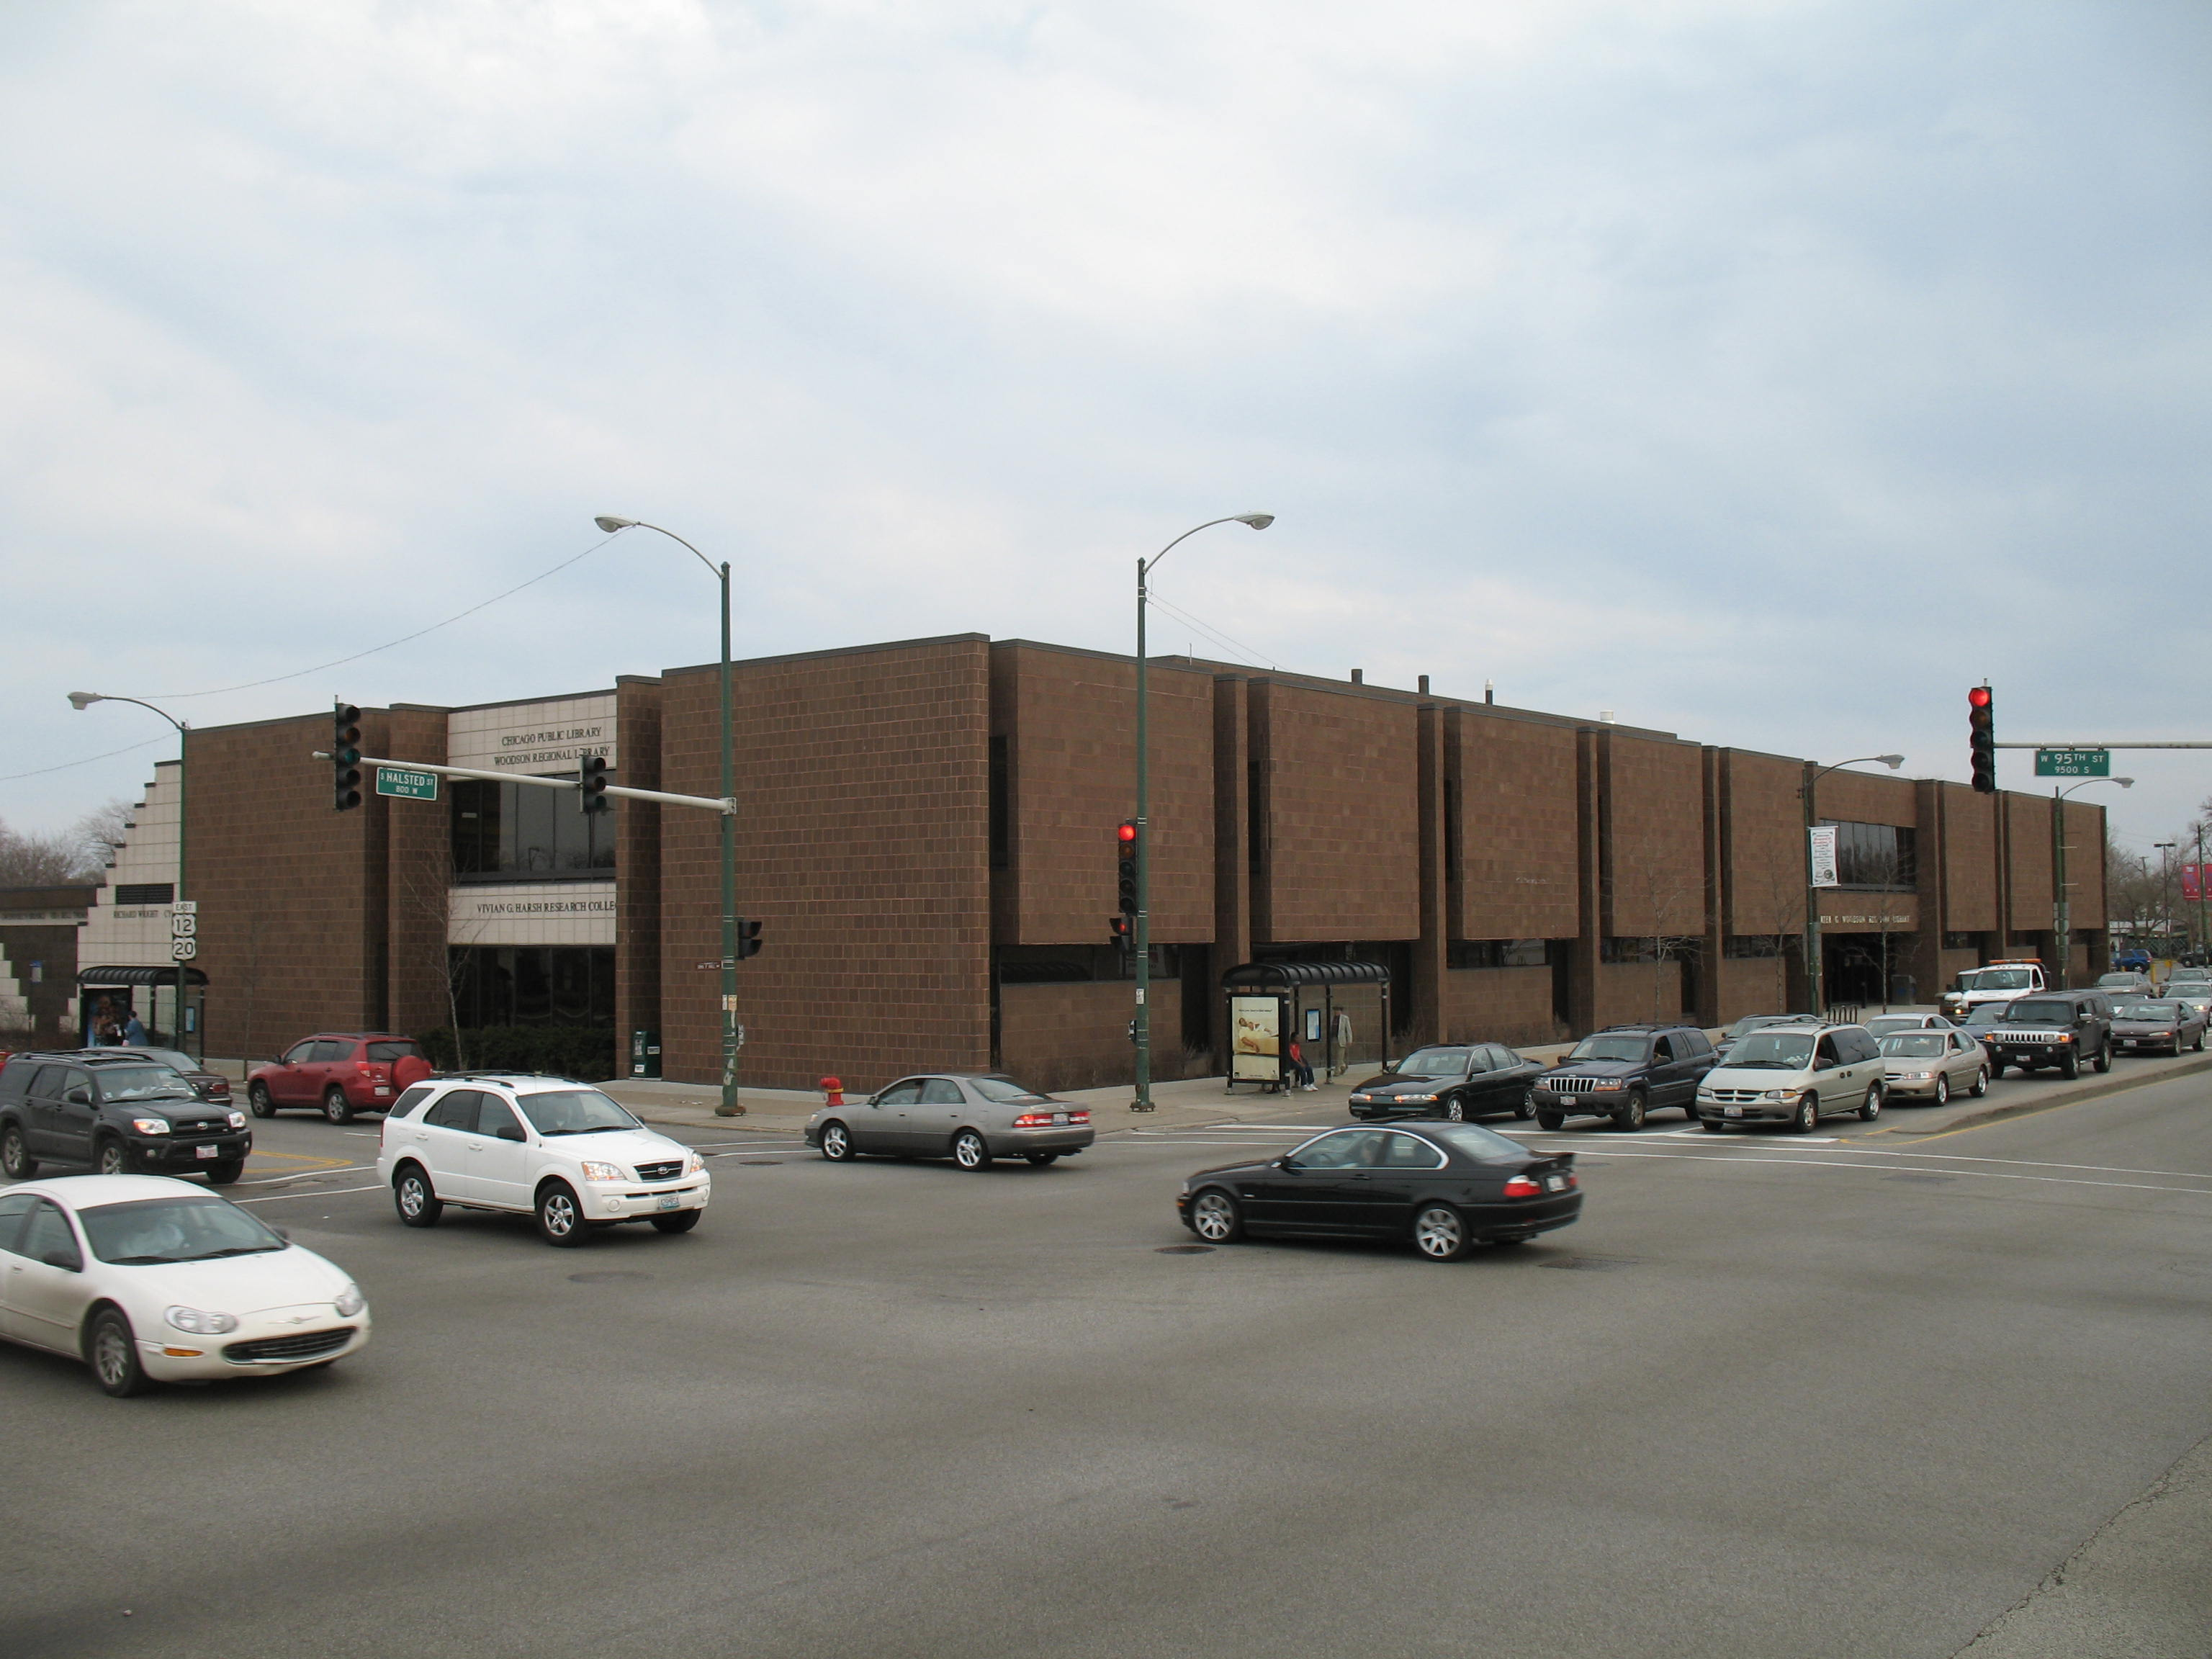 Carter G Woodson Regional Library